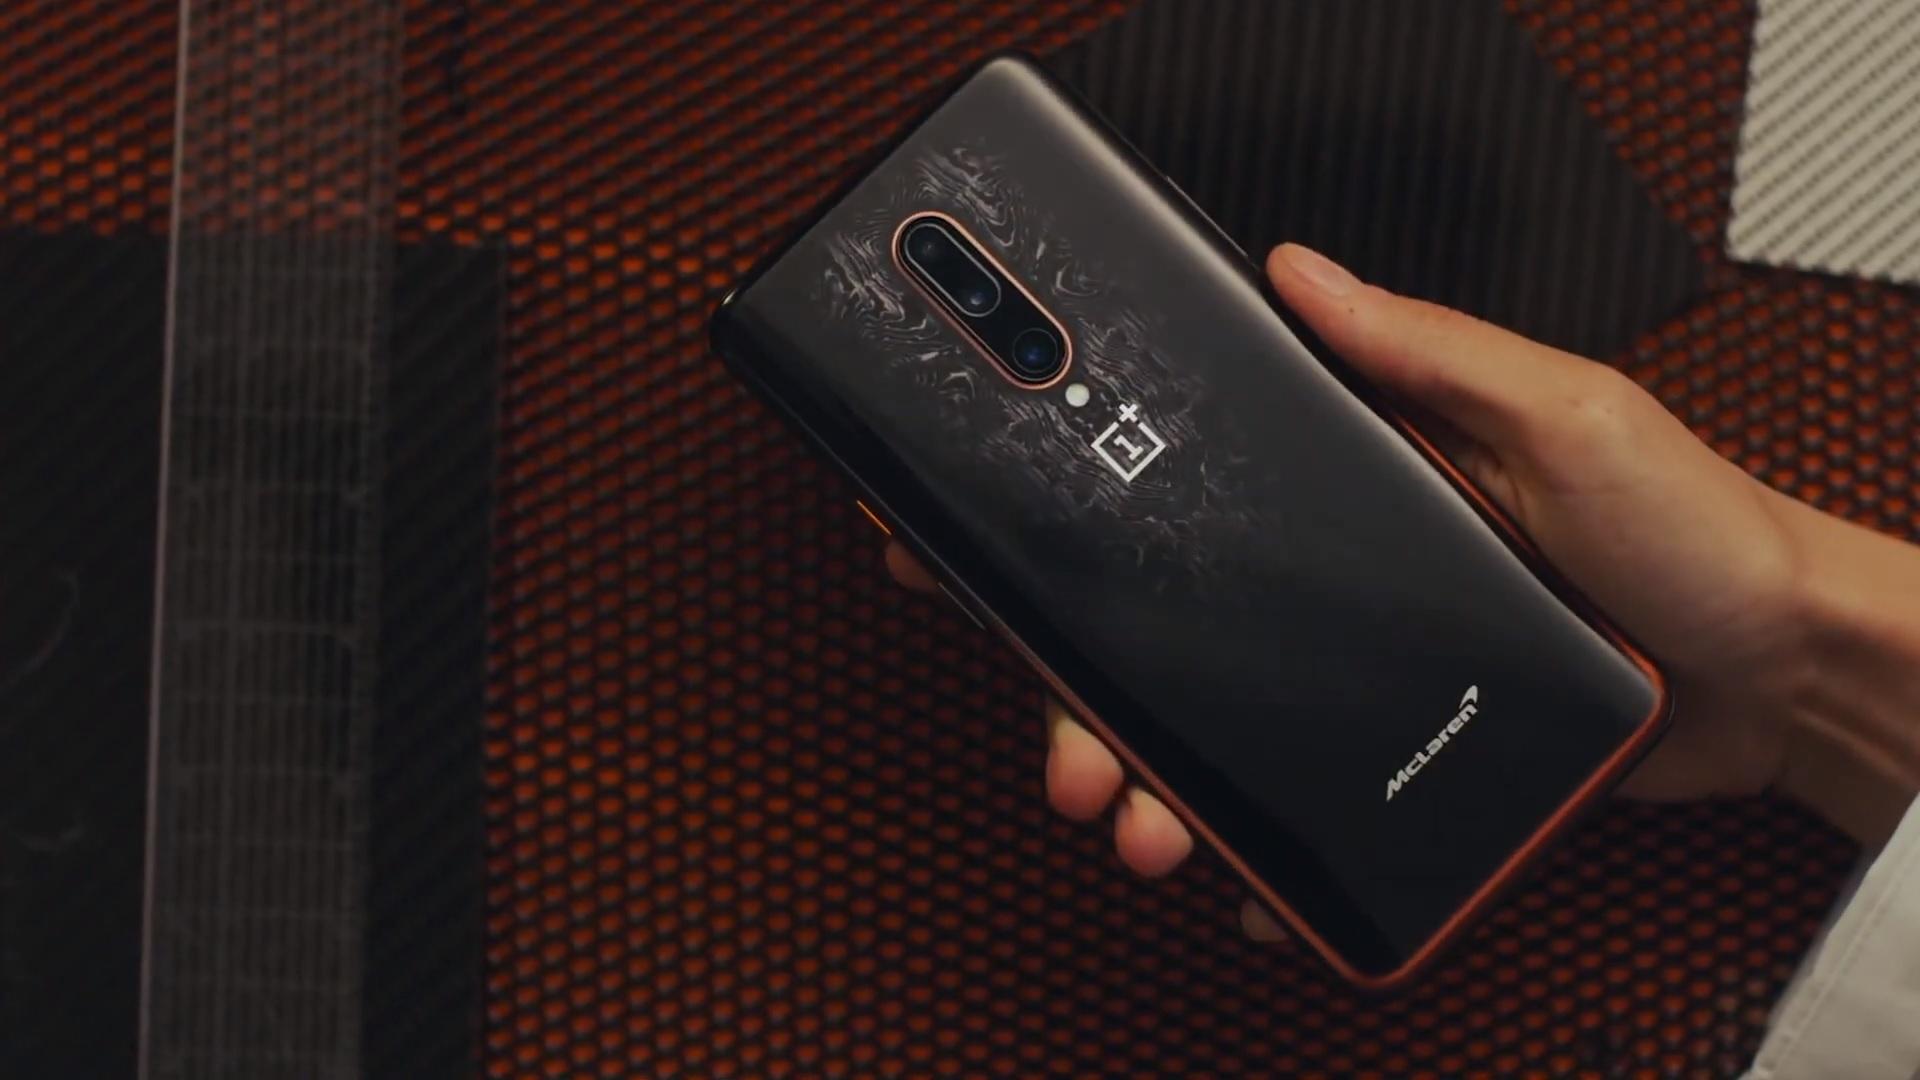 OnePlus 7T McLaren Edition smartphone